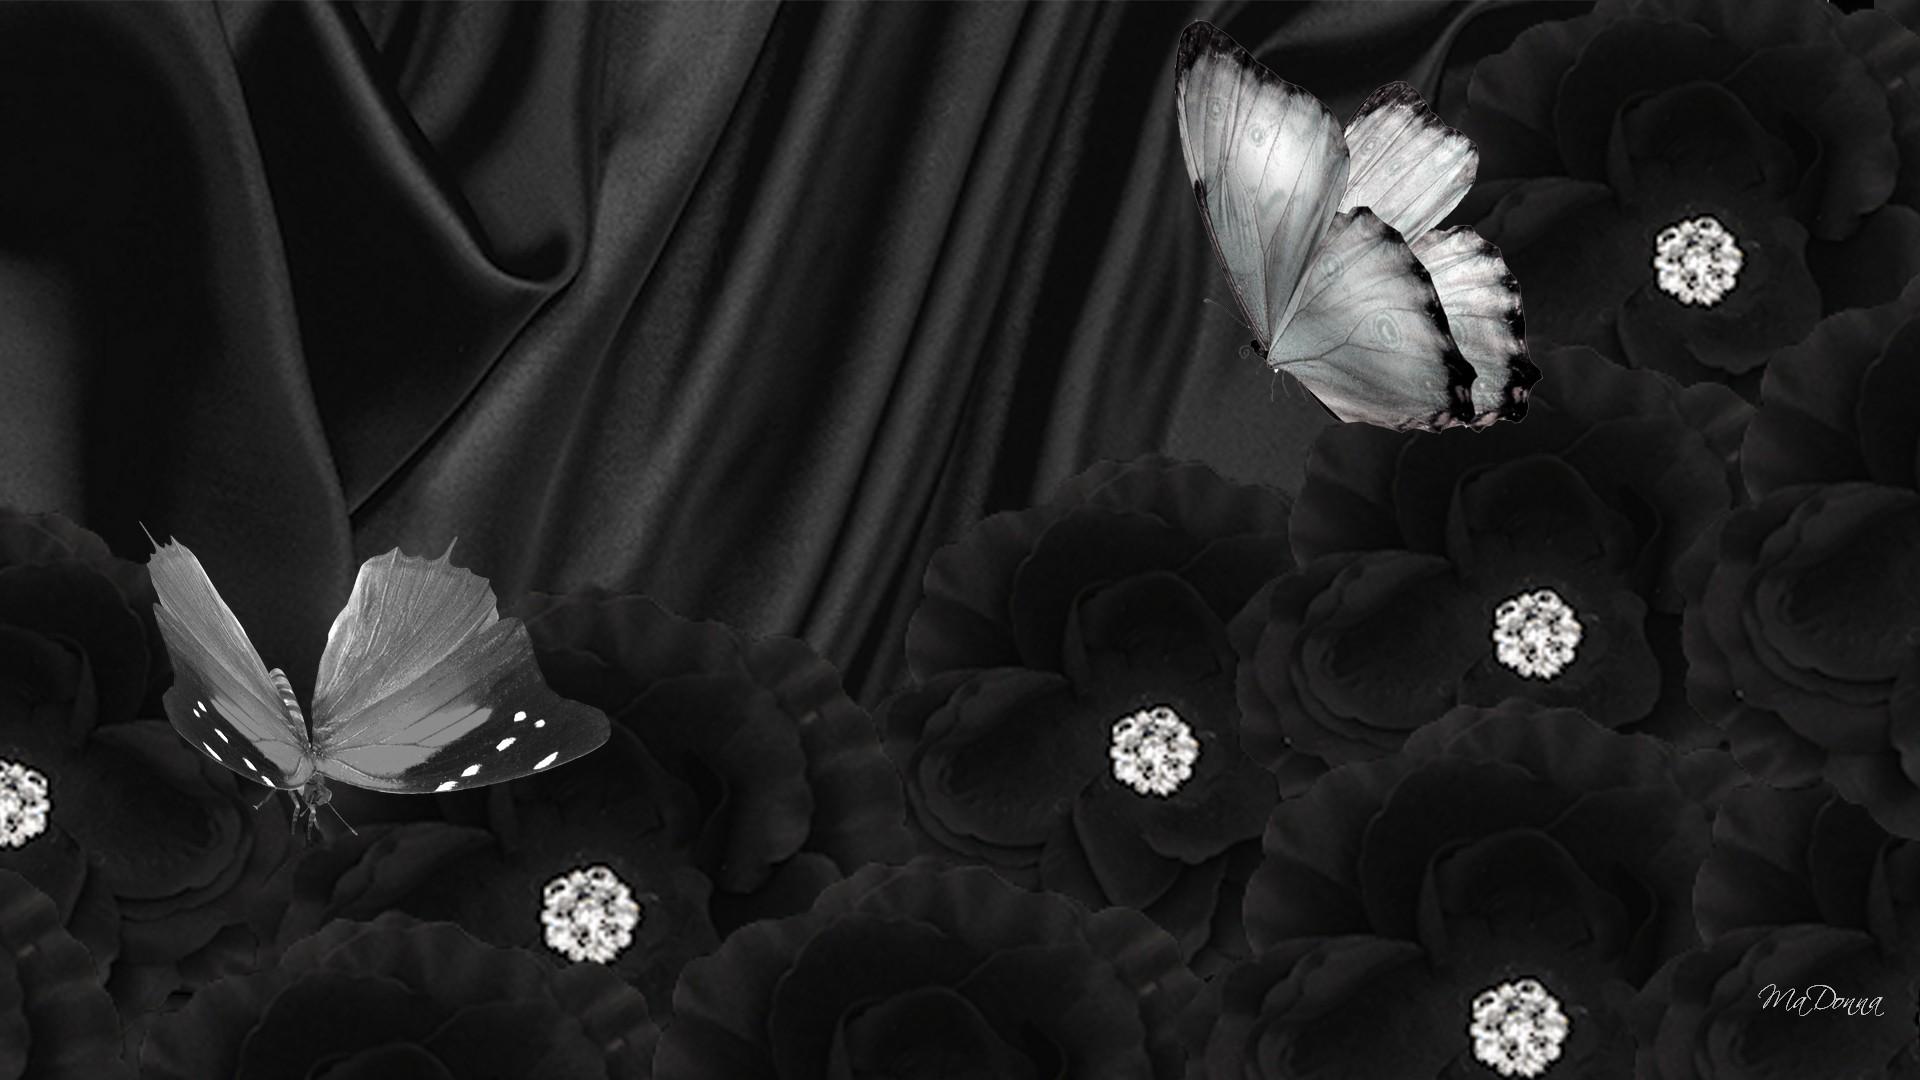 44 Black Butterfly Background Wallpaper On Wallpapersafari